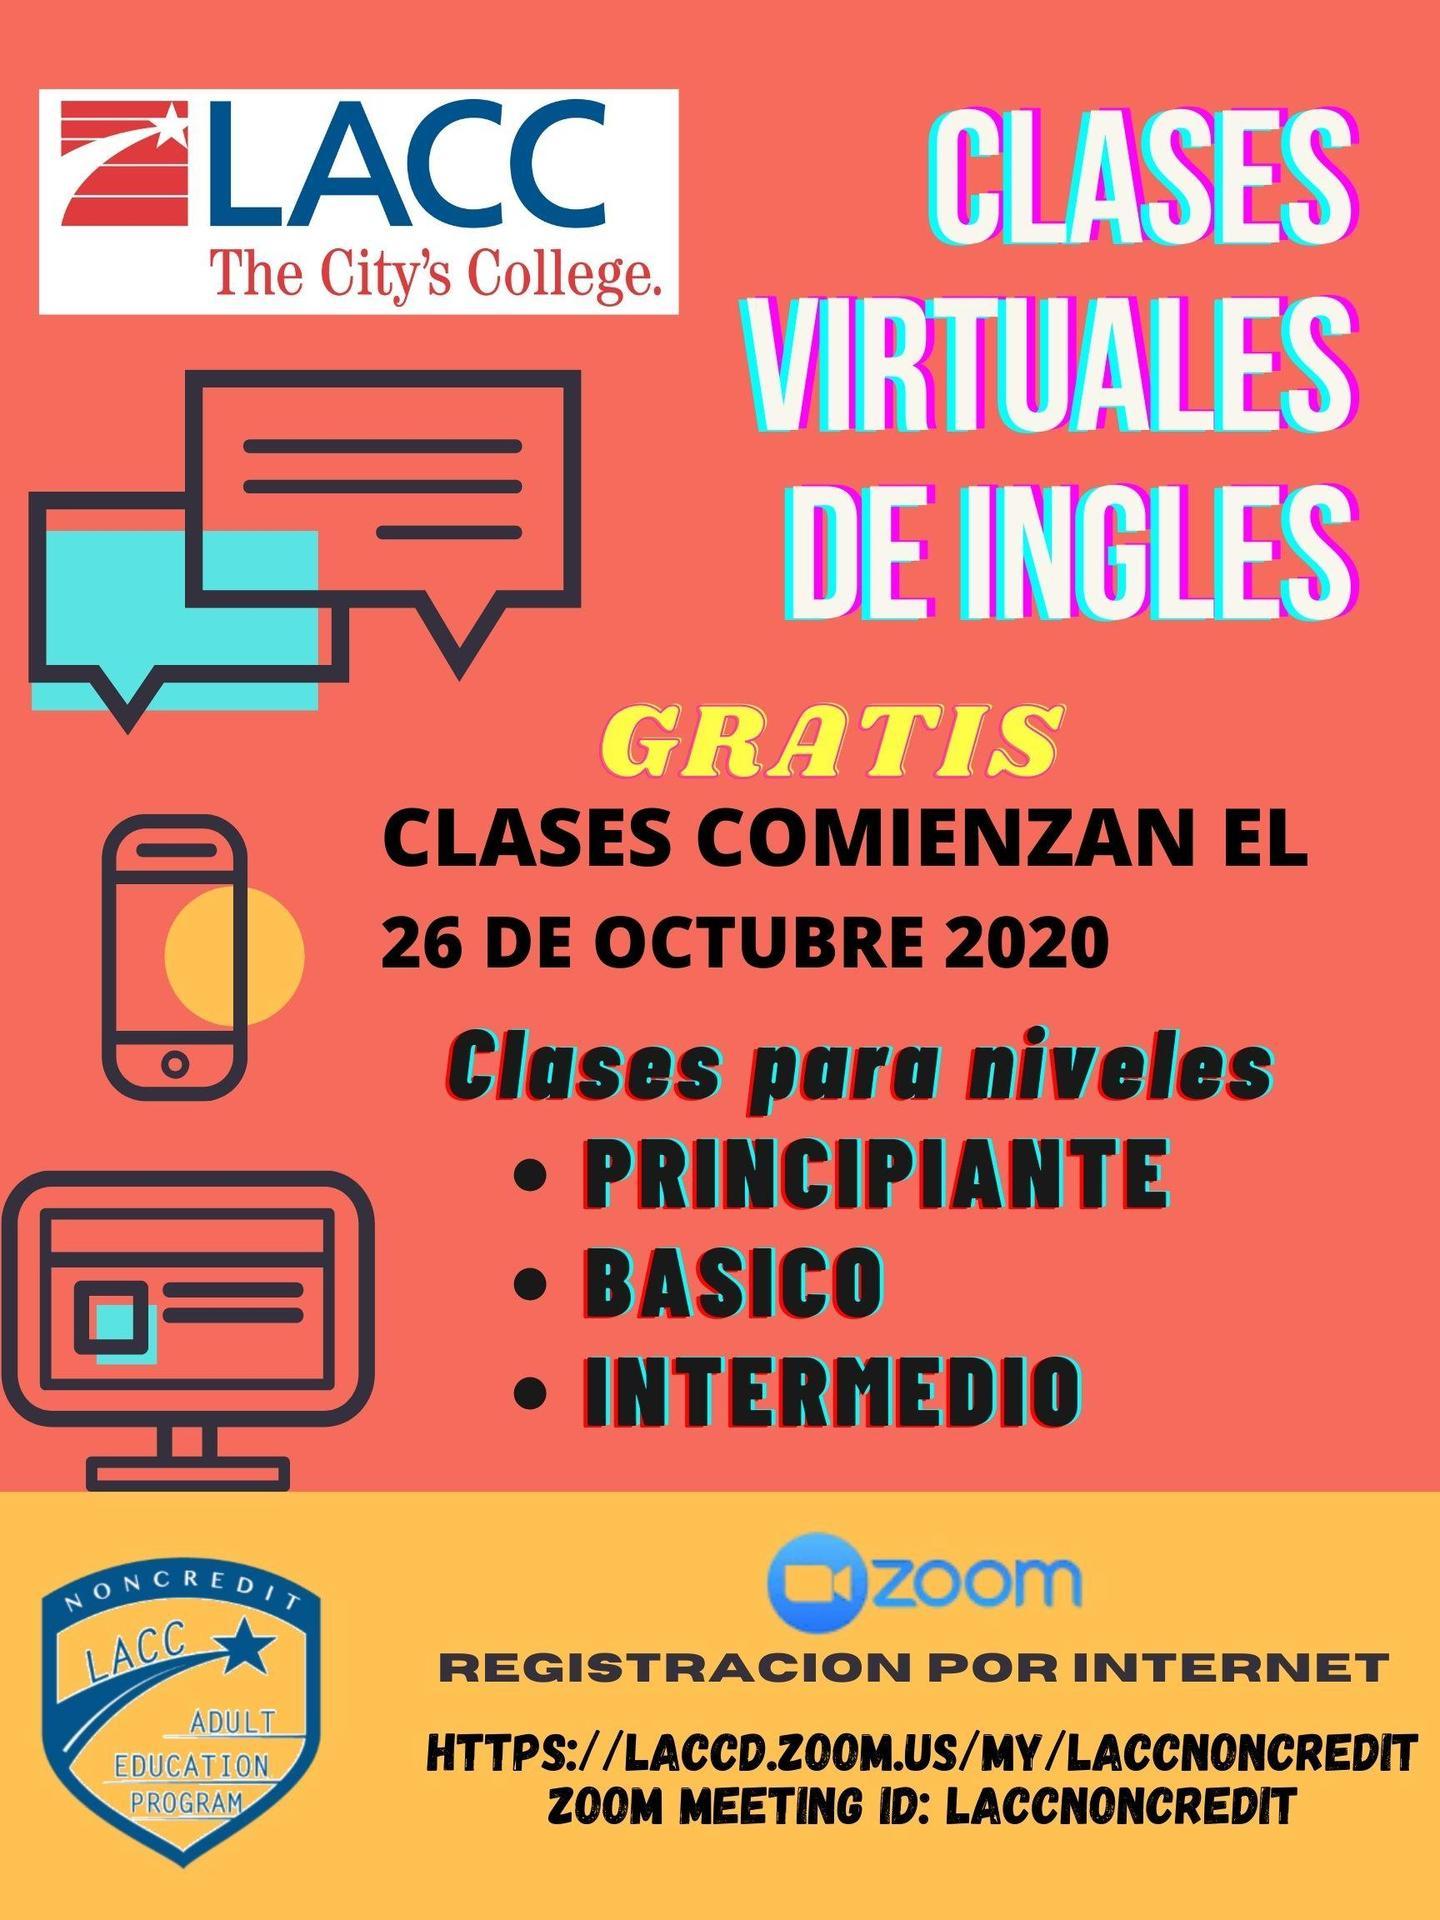 Clases Virtuales De Ingles